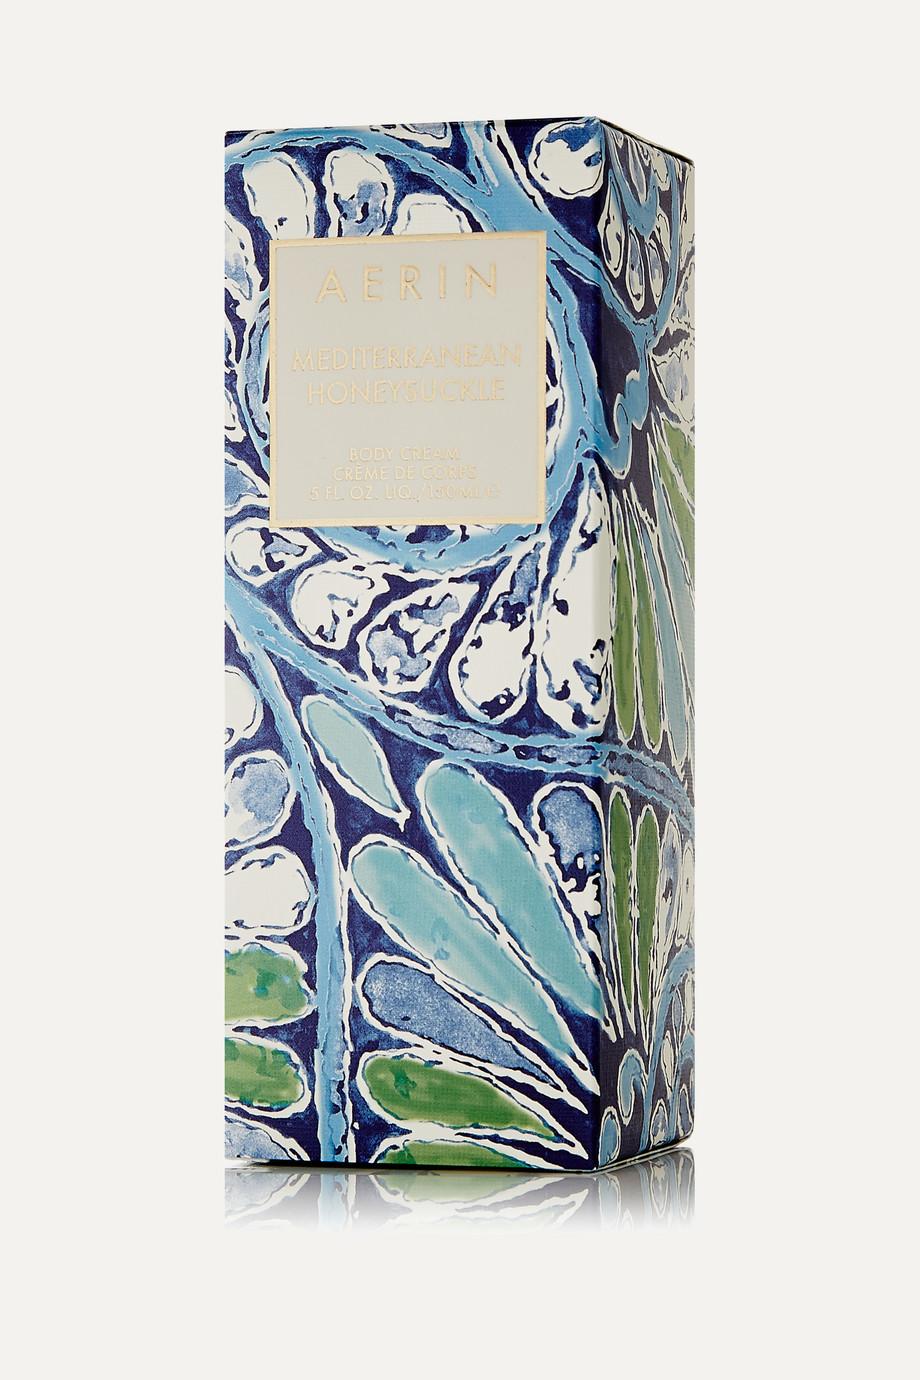 AERIN Beauty Mediterranean Honeysuckle Body Cream, 150 ml – Körpercreme